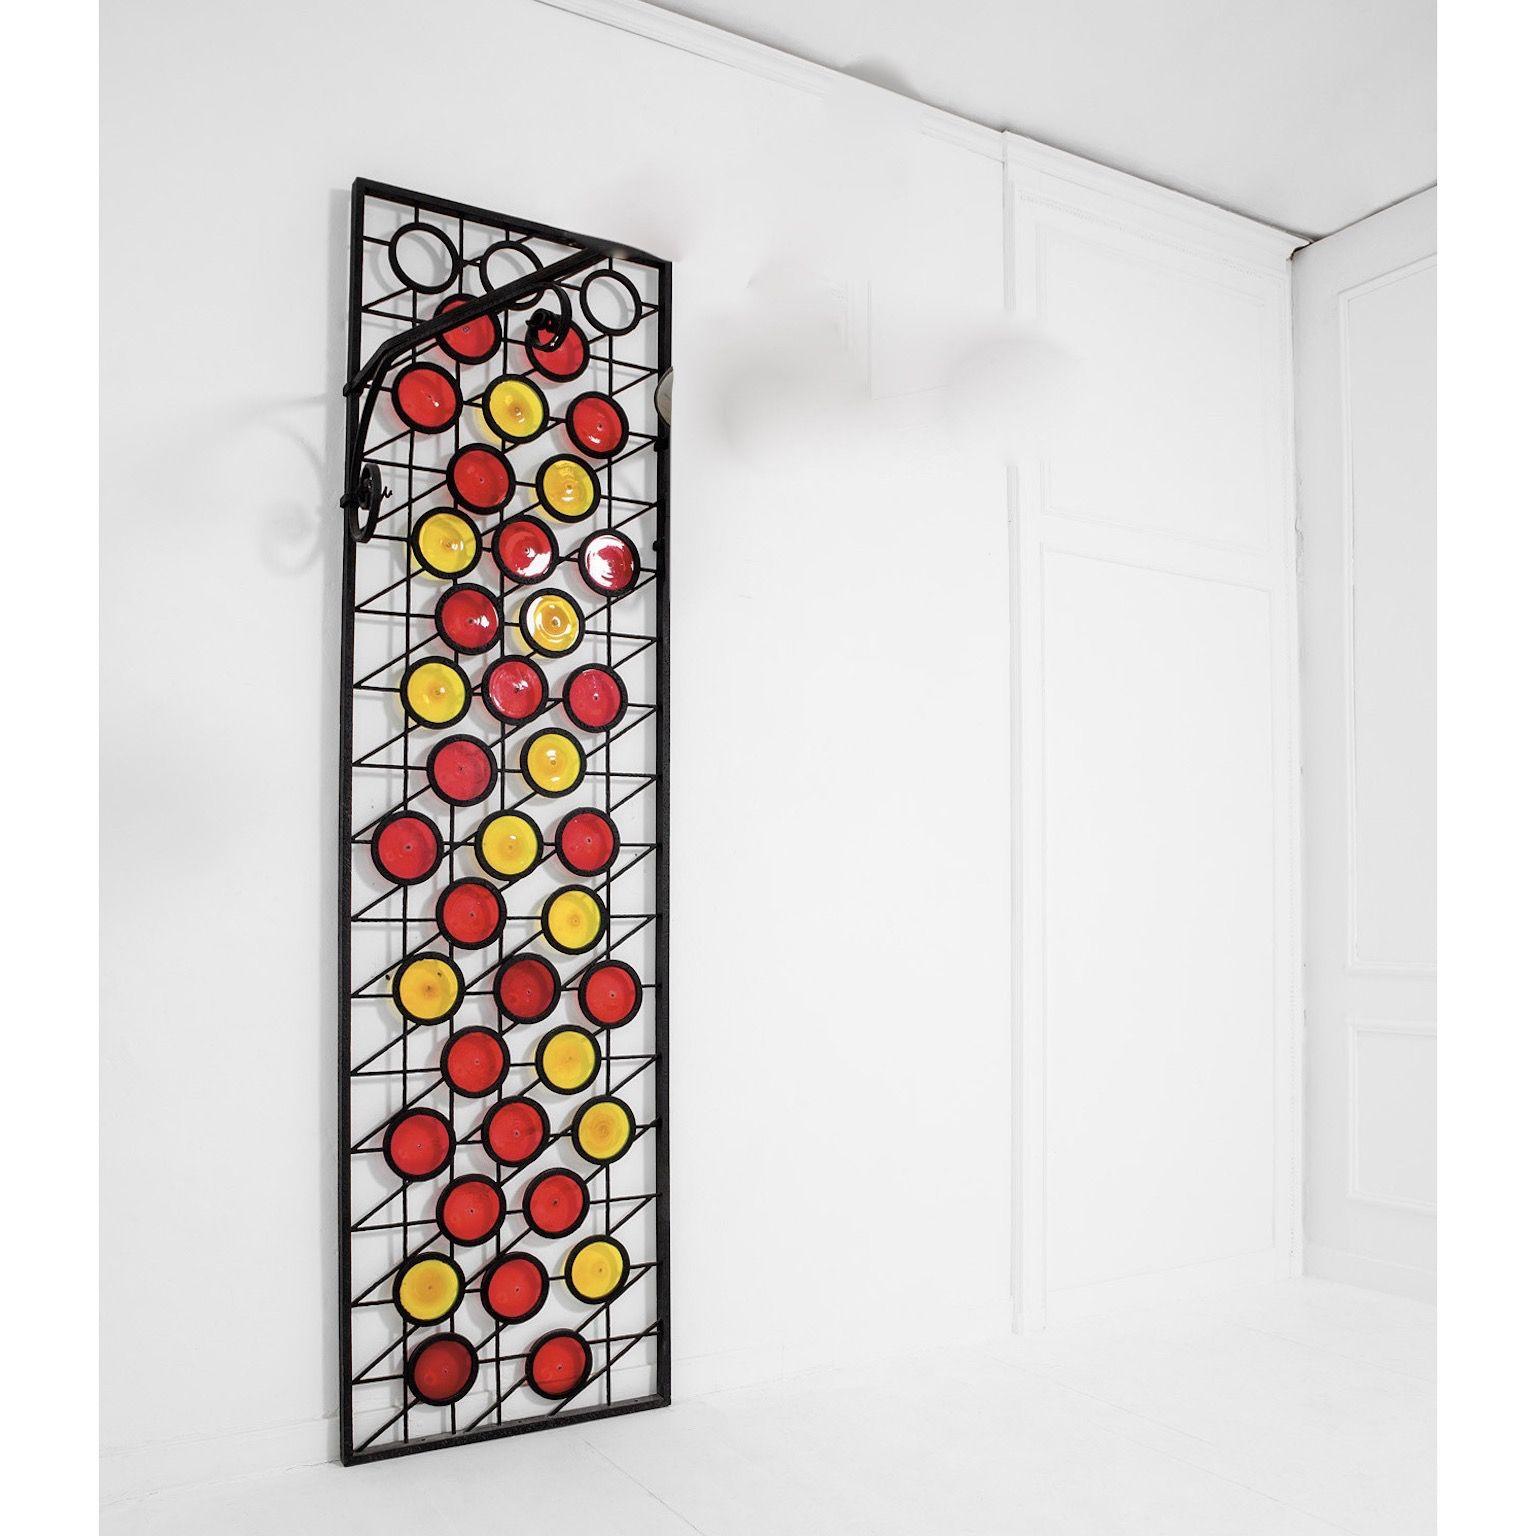 Pareti Divisorie In Vetro Colorato wrought iron panel screen or divider with colored glass